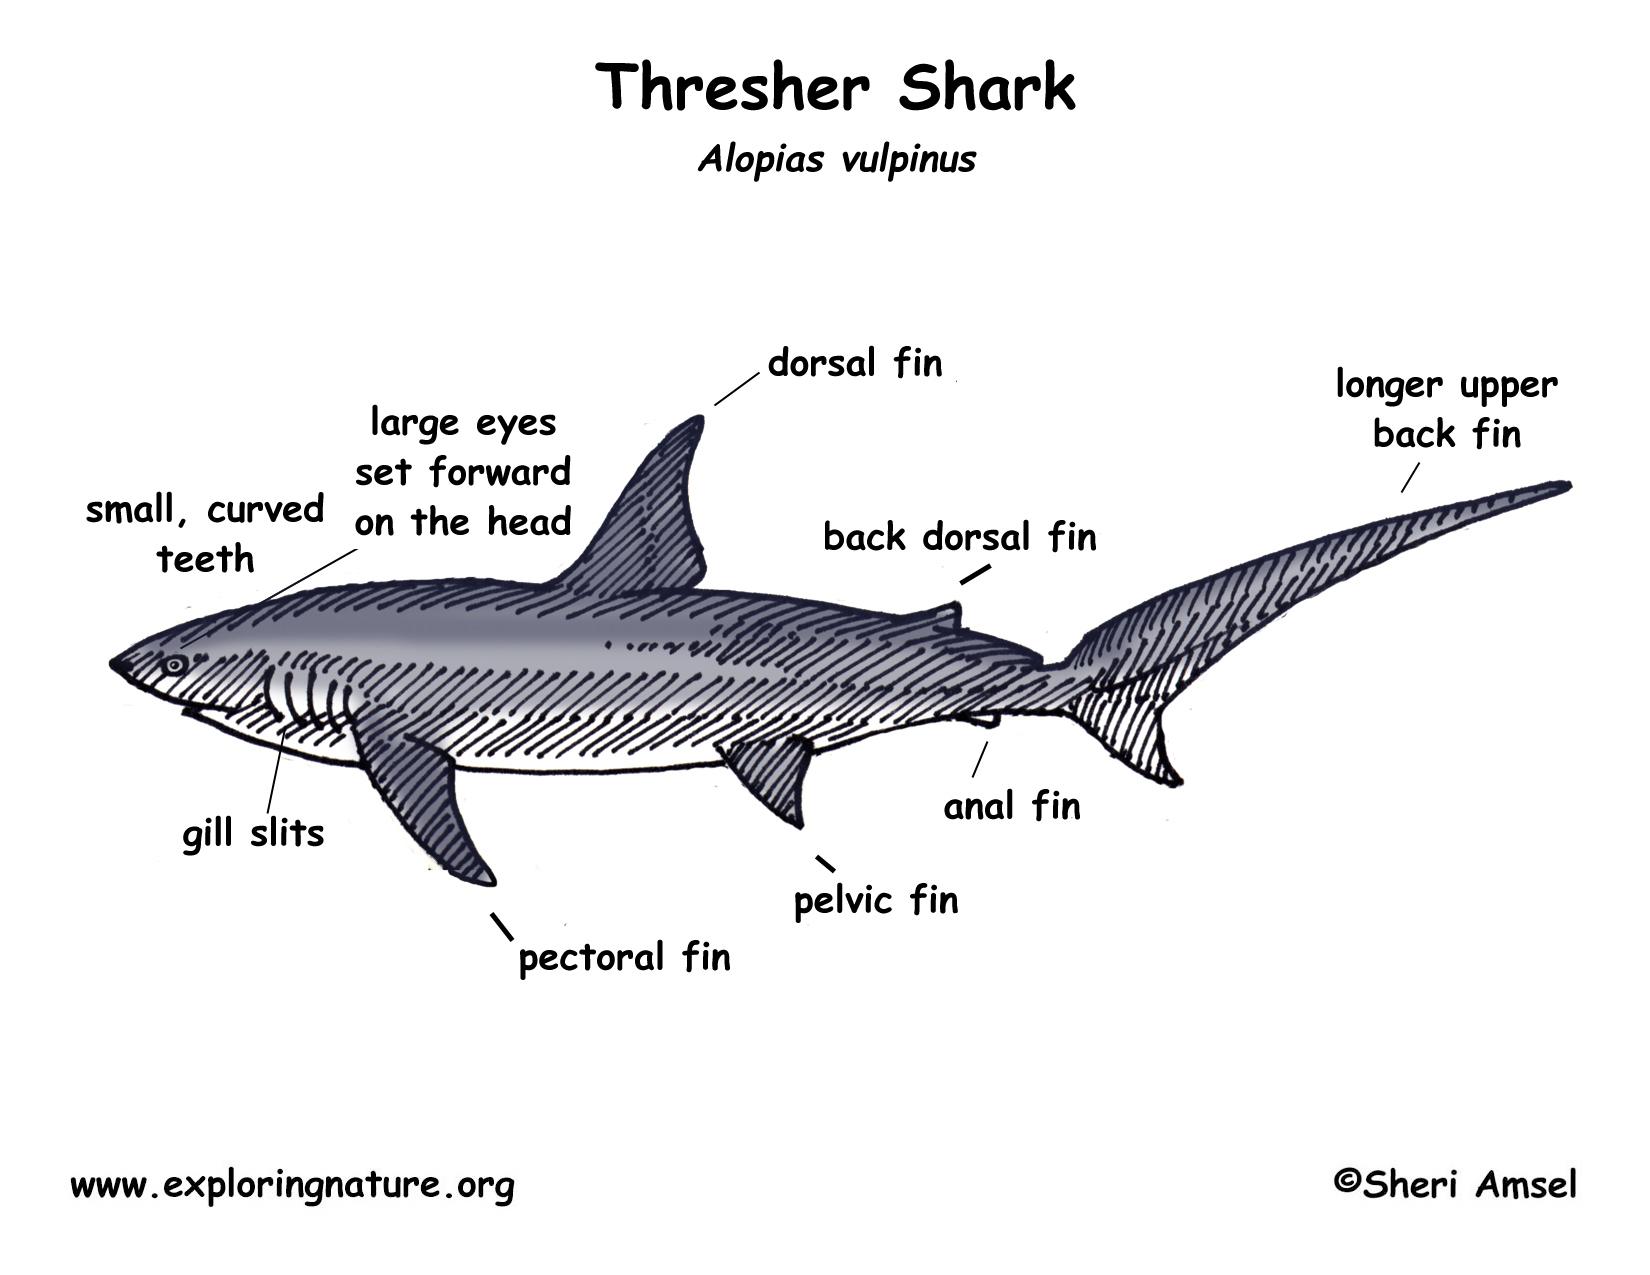 labeled squid external anatomy diagram 1993 chevy silverado fuel pump wiring shark thresher